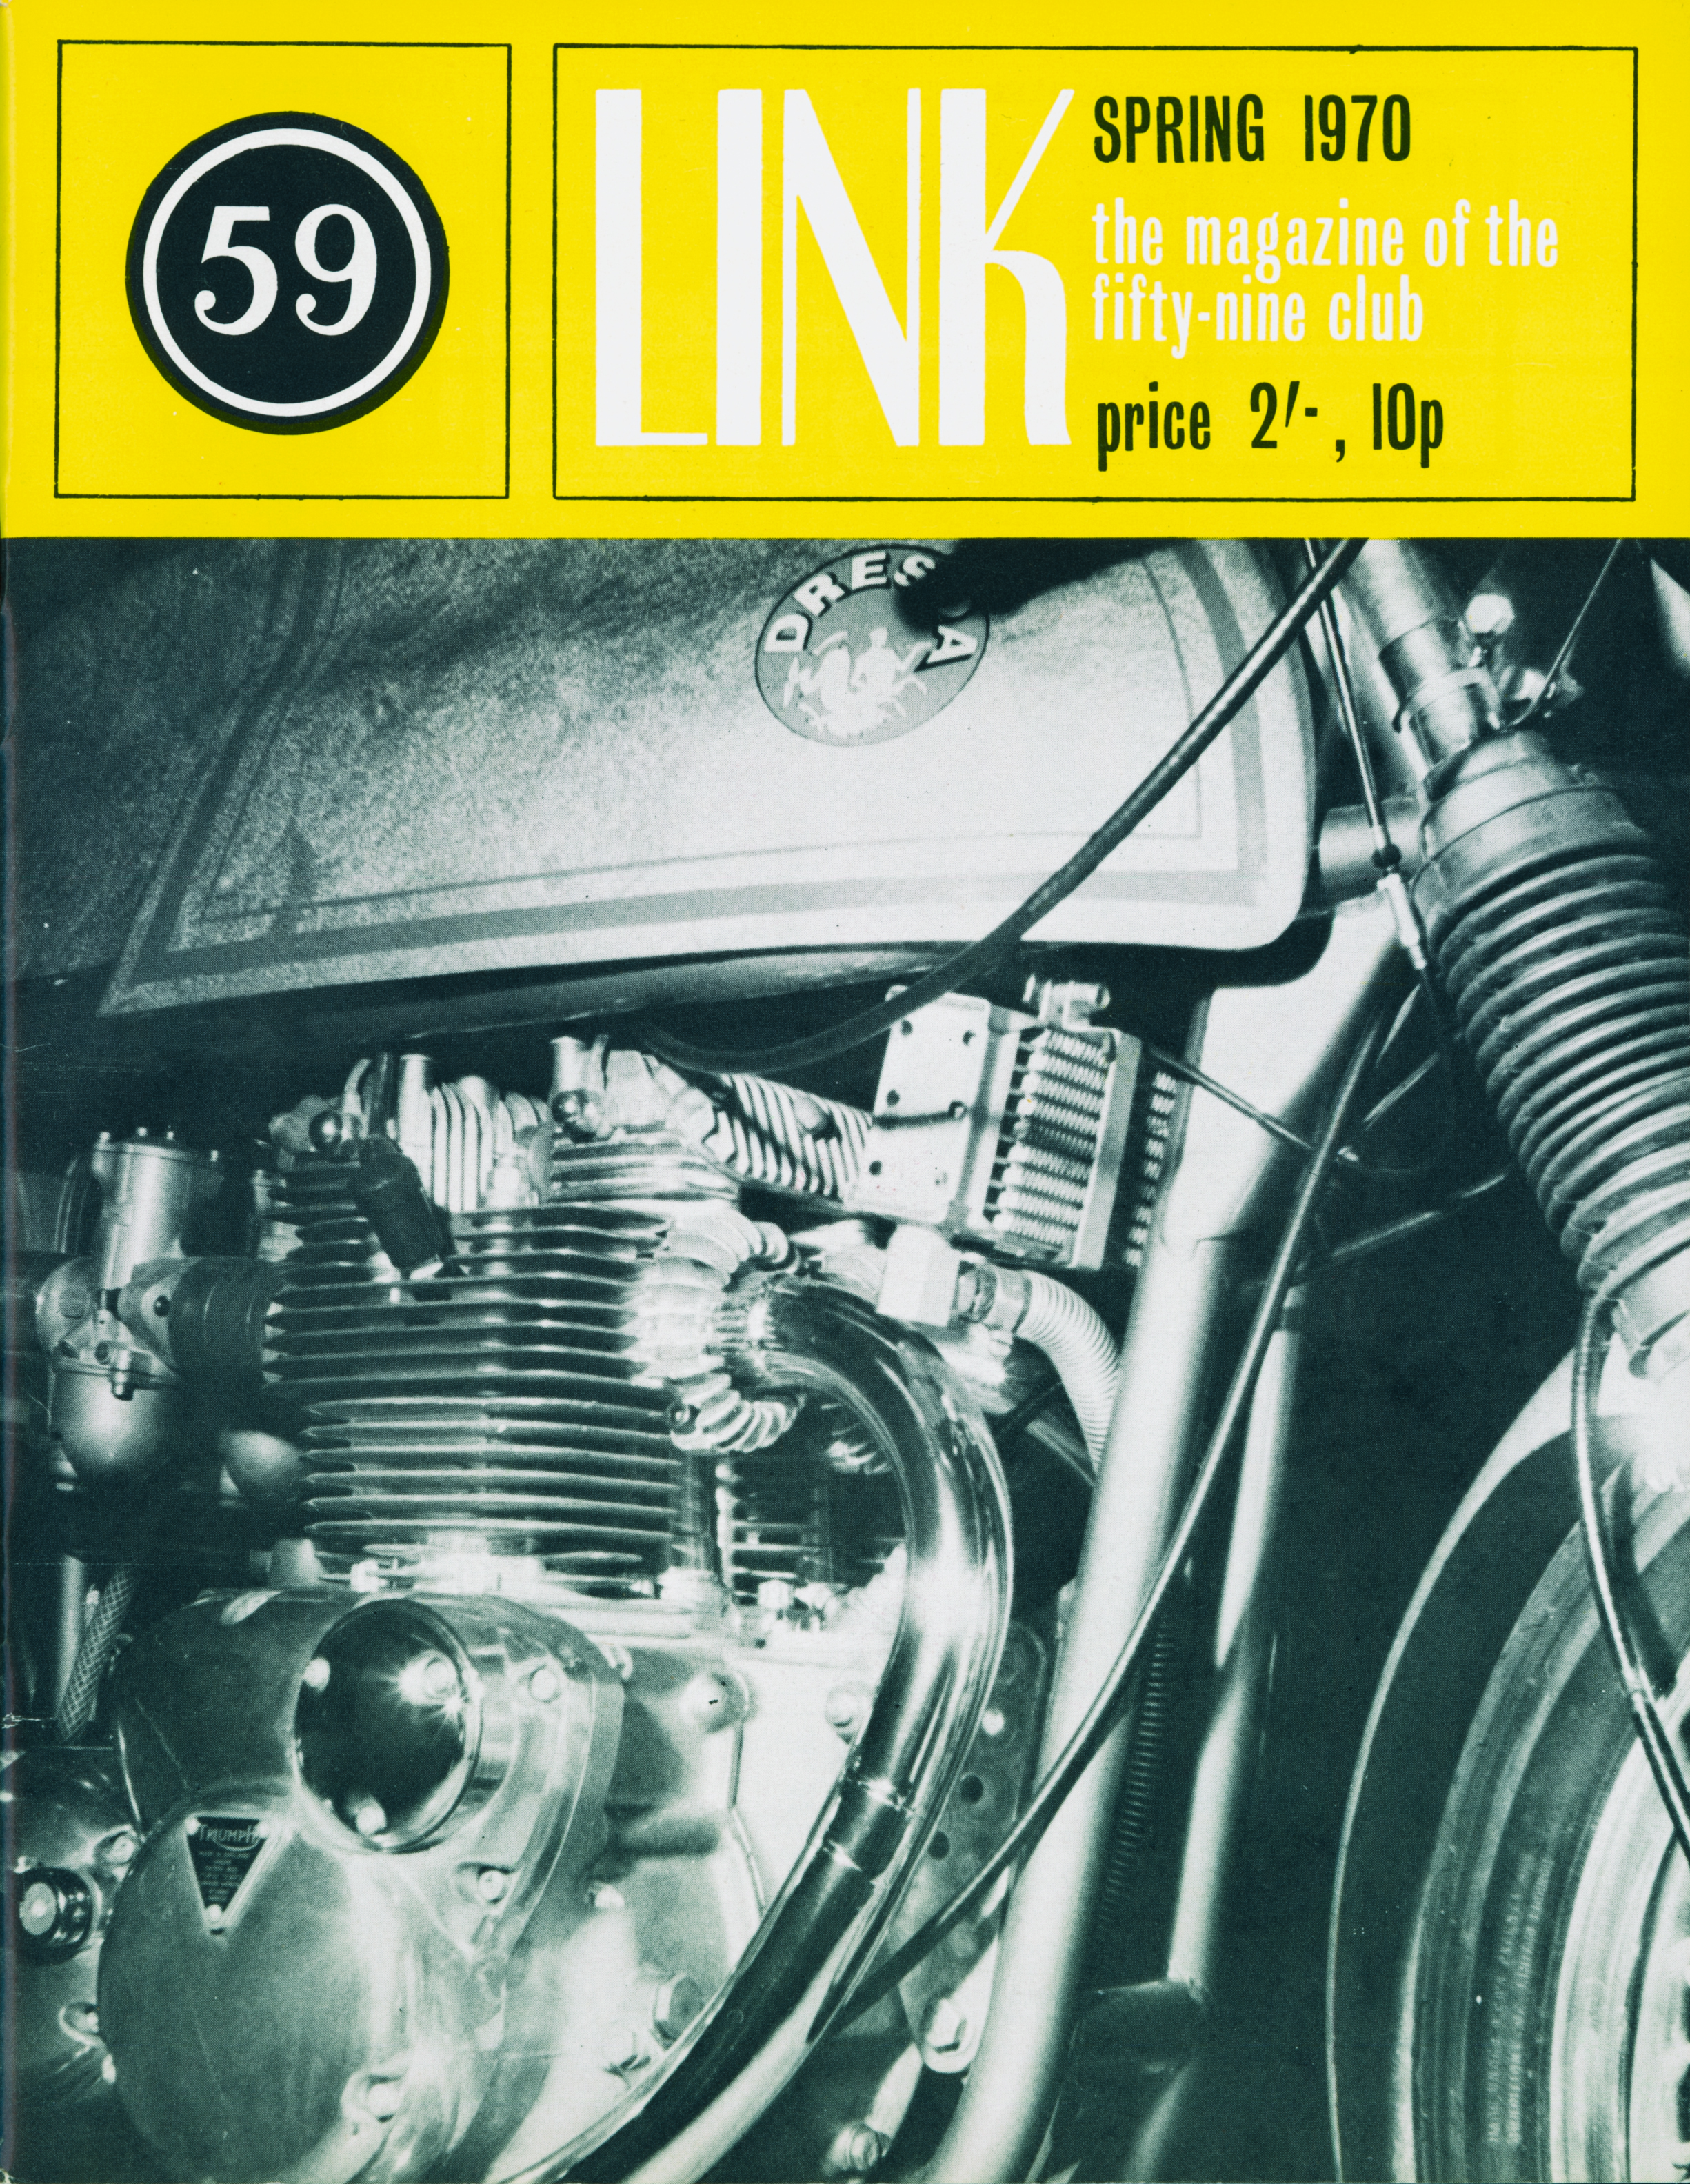 link spring 70.jpg